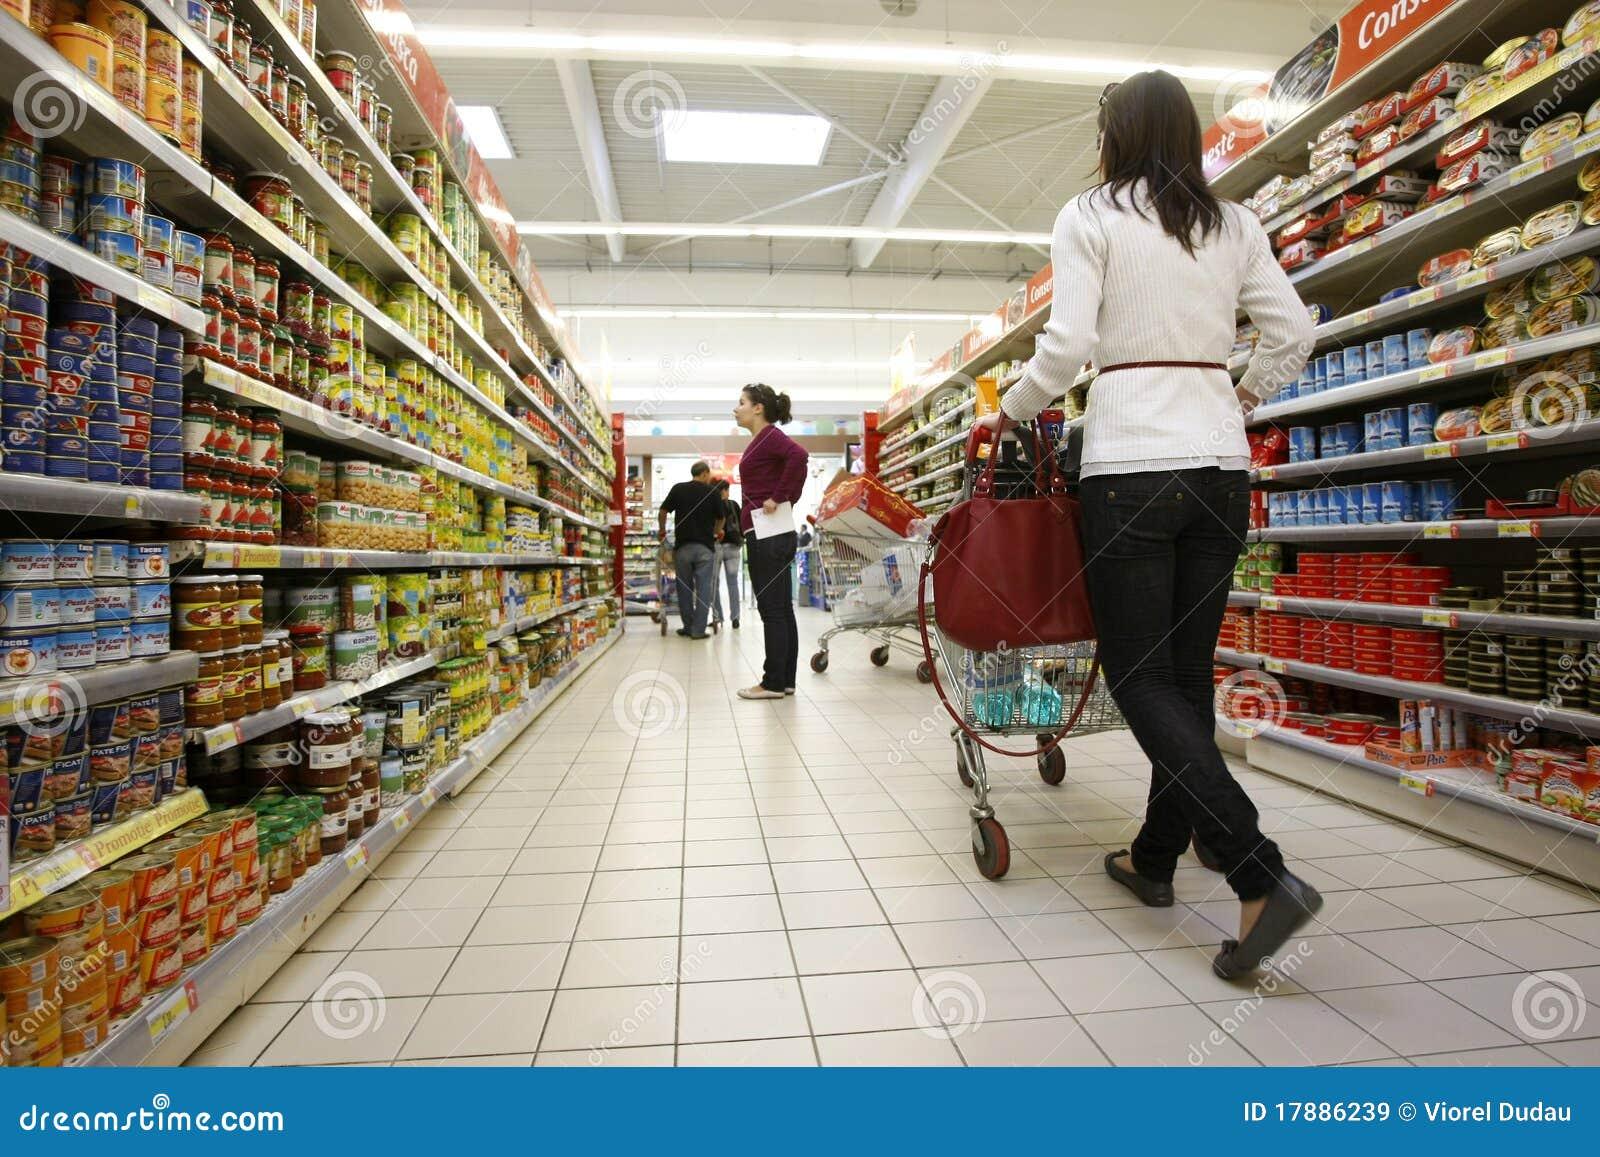 Customers Shopping At Supermarket Editorial Stock Image - Image ...